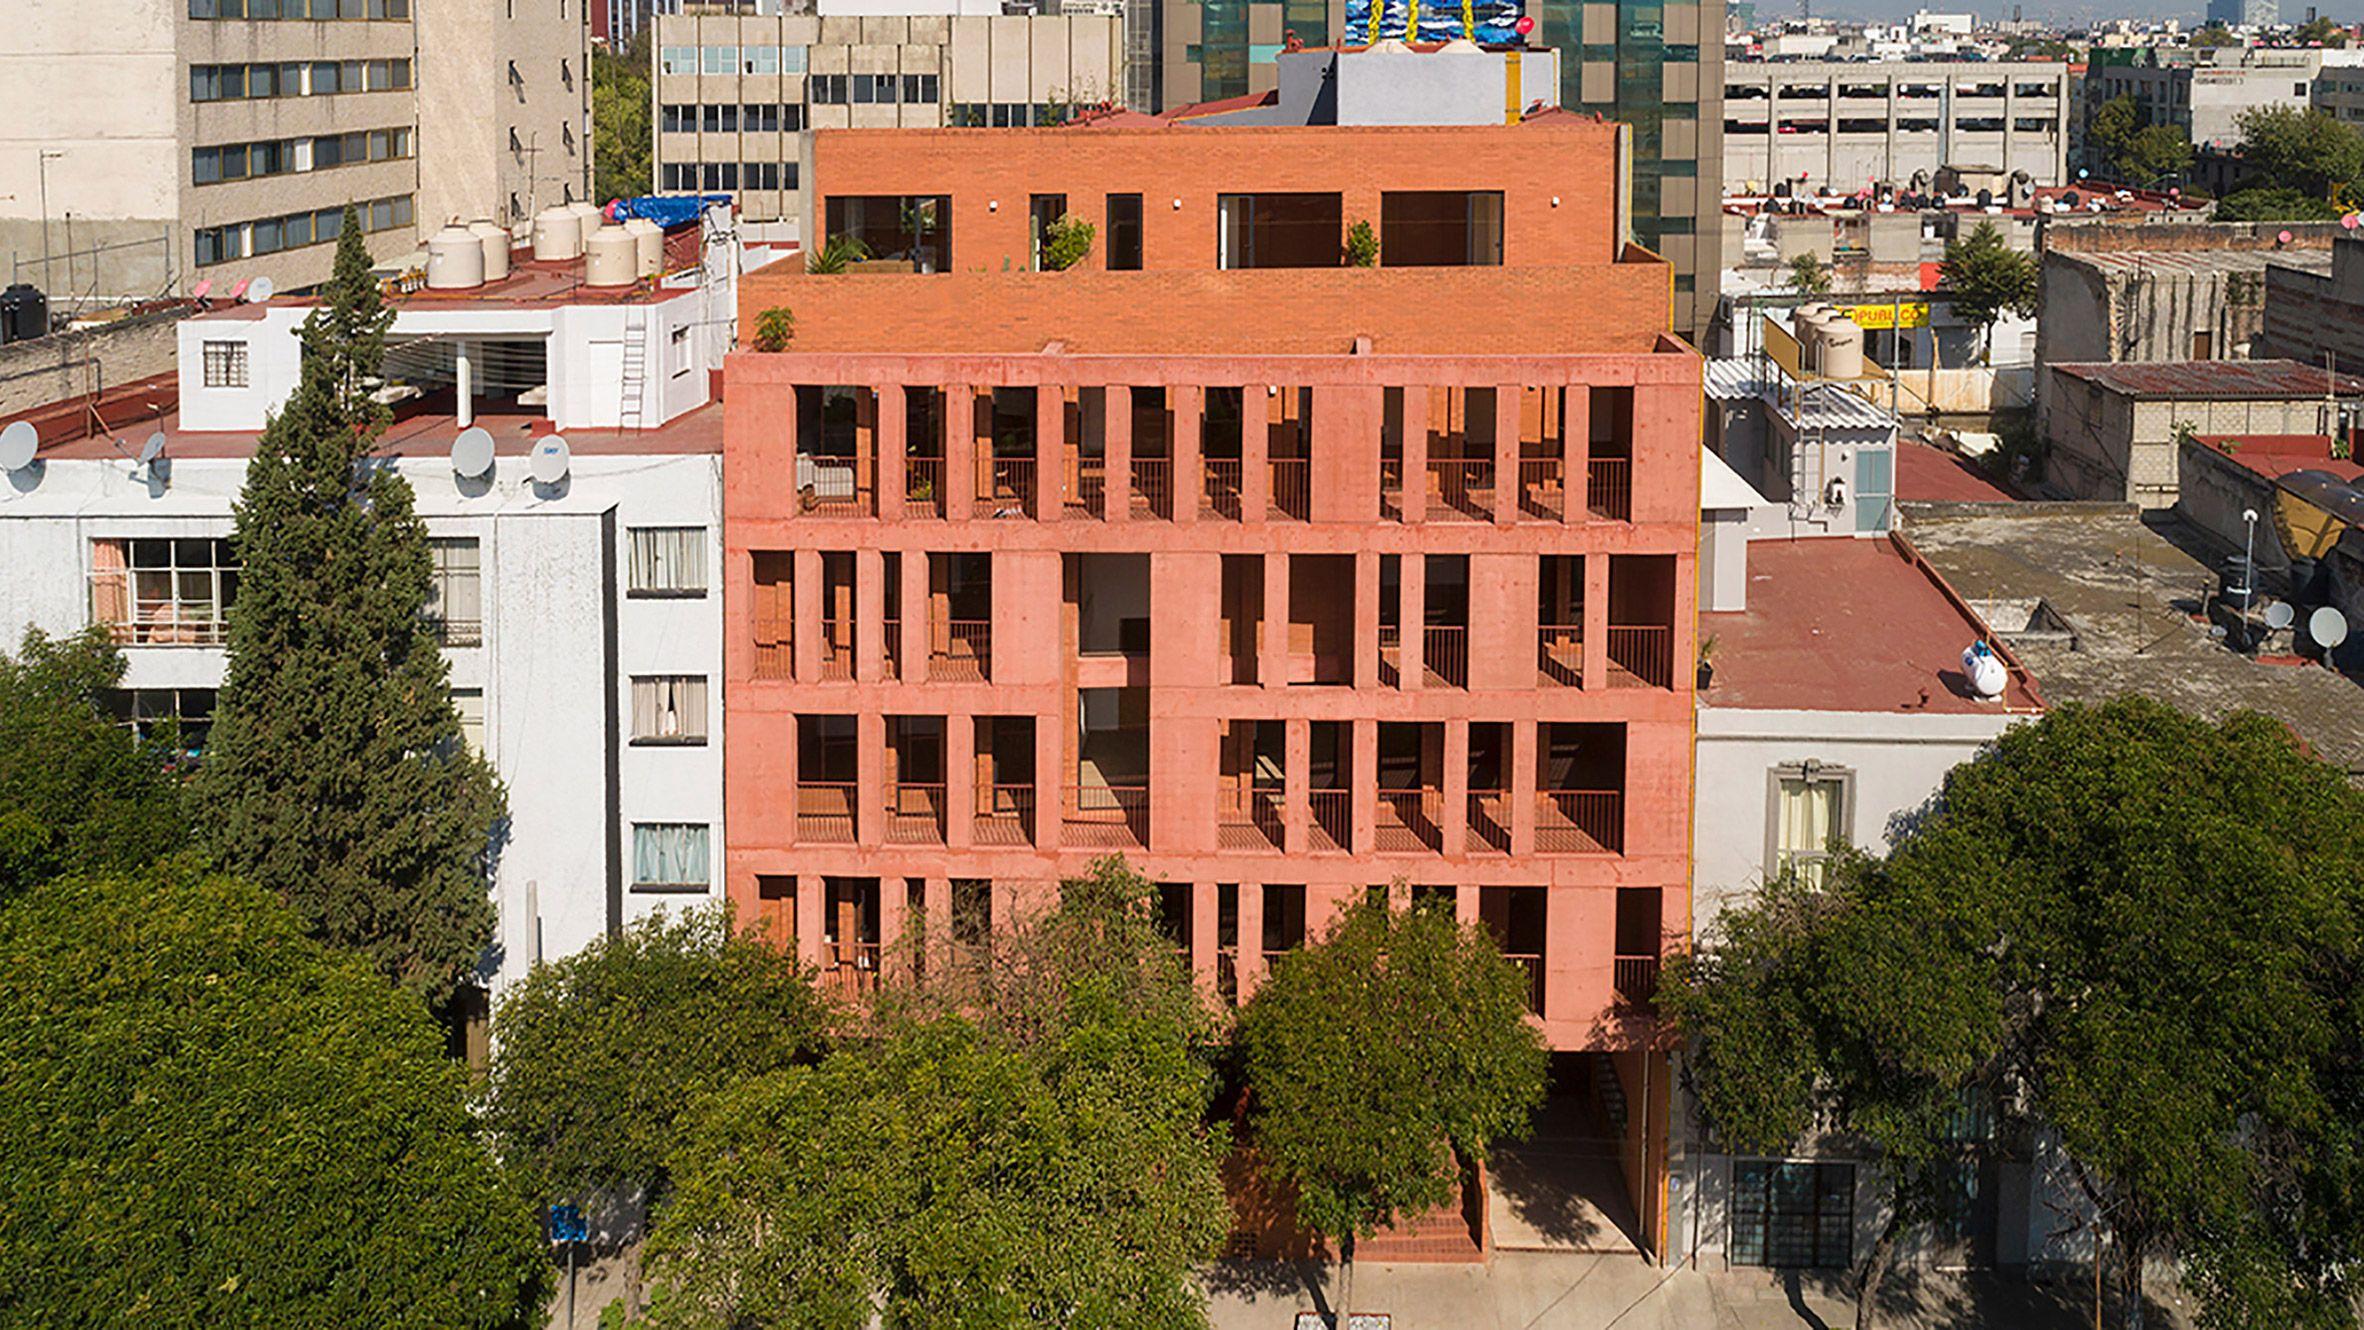 Reddish Facades Generous Balconies And Open Air Corridors Define